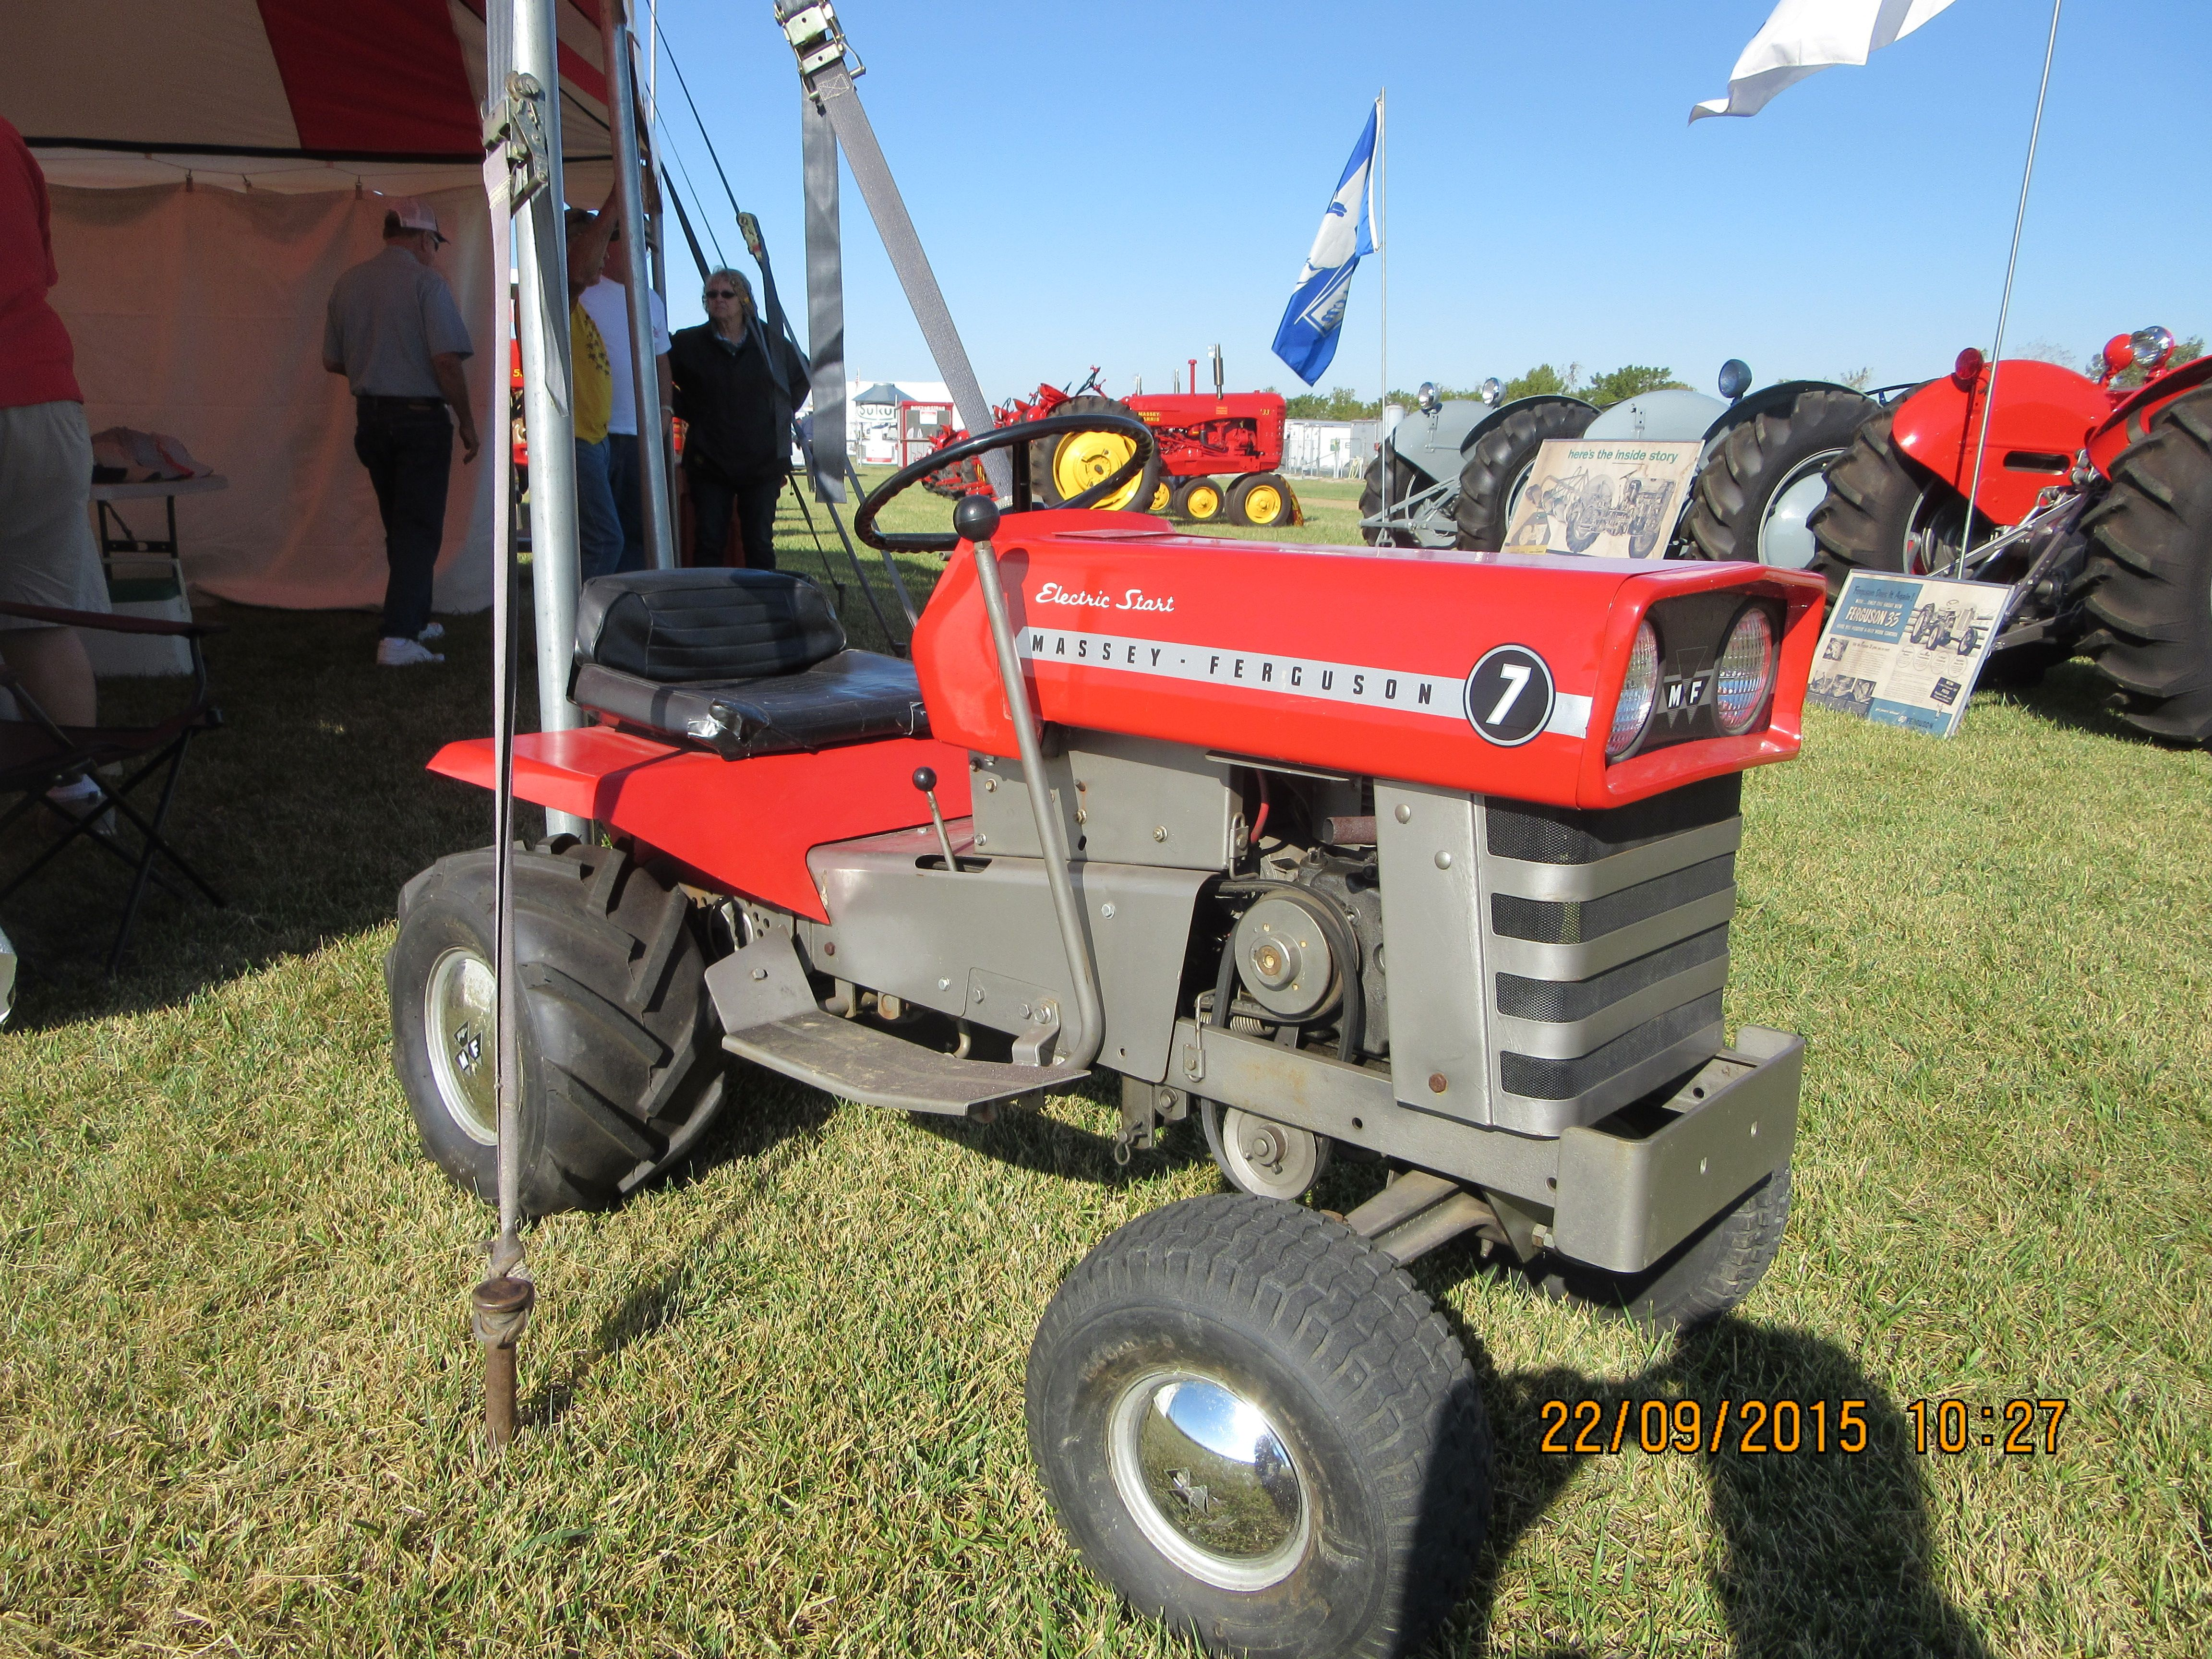 Massey Ferguson 7 lawn & garden tractor